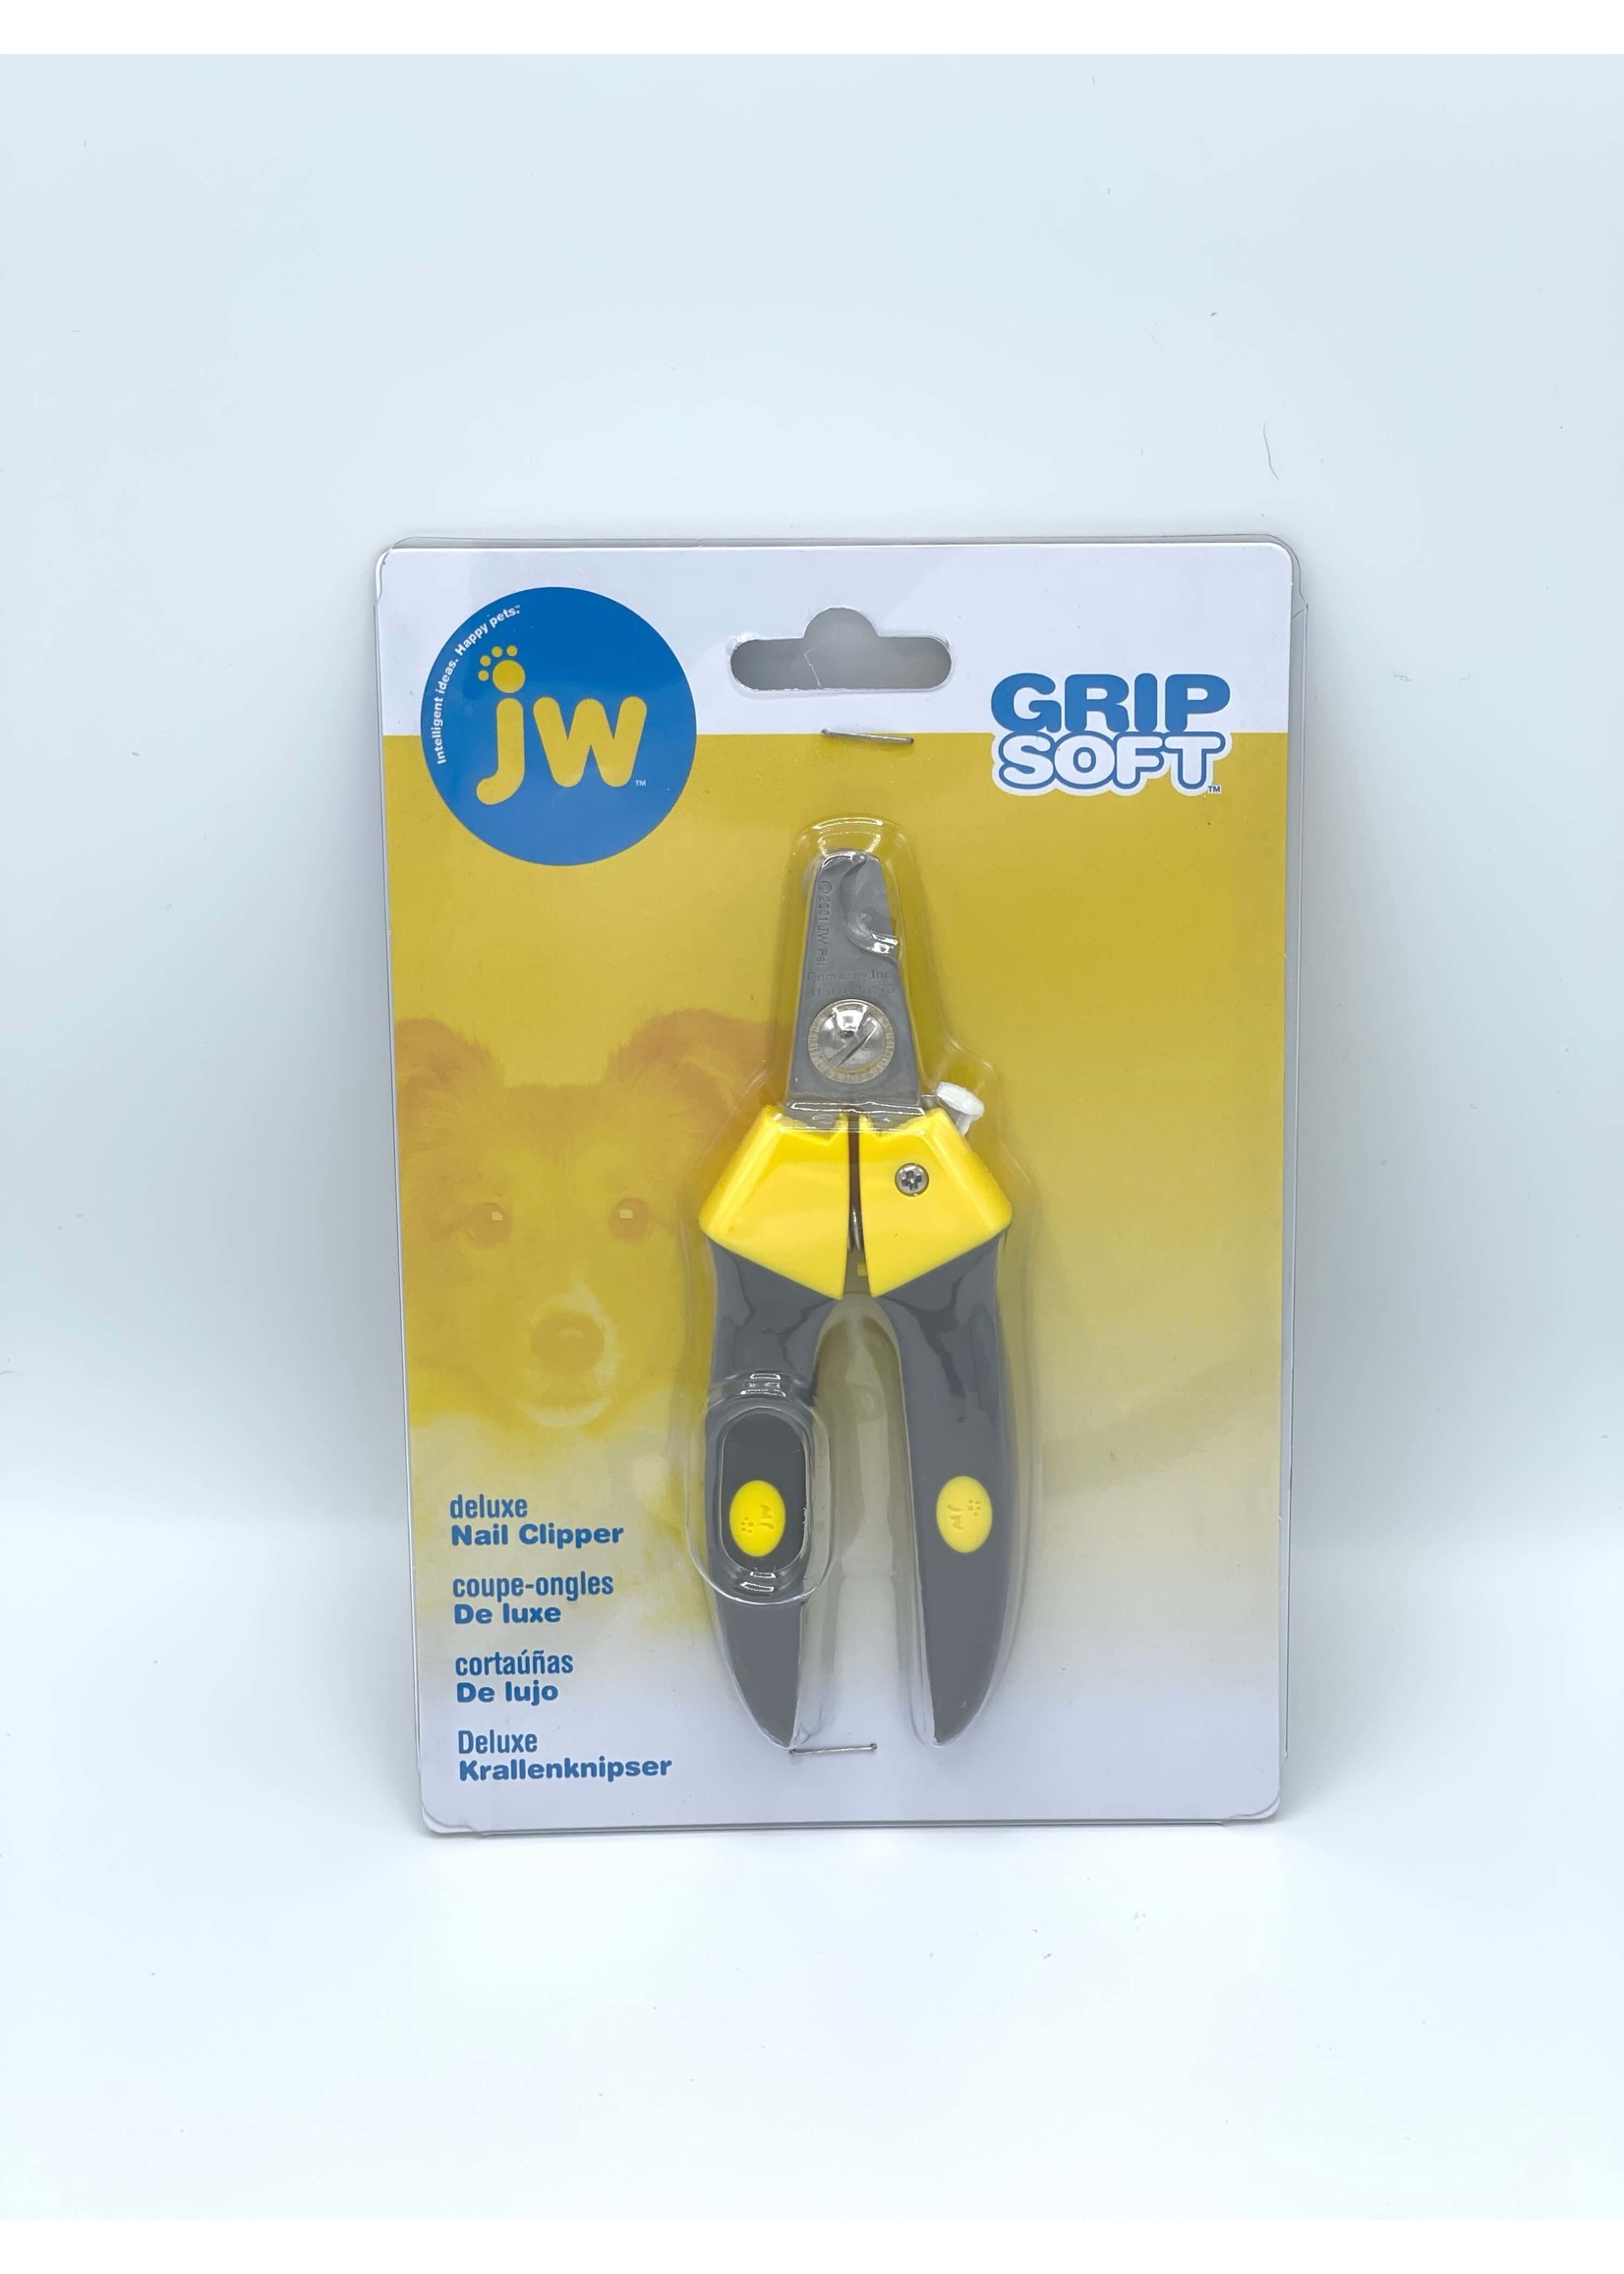 JW JW GripSoft Dog Nail Clipper